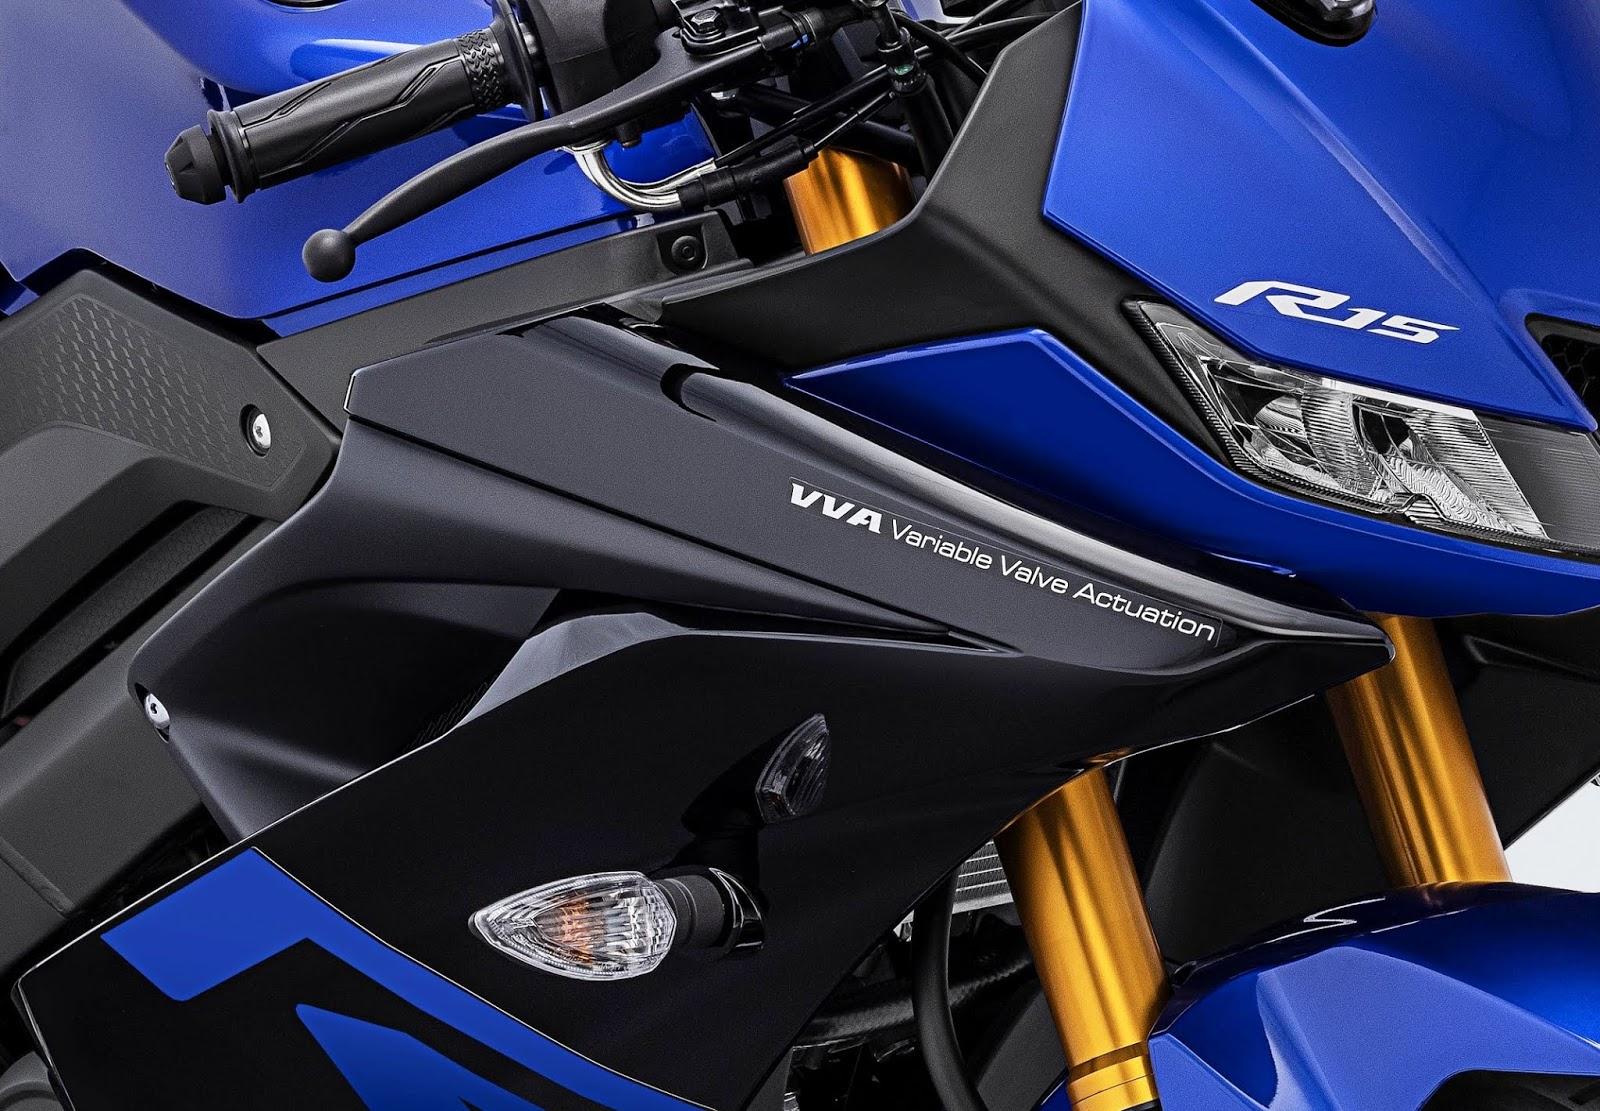 Yamaha Indonesia resmi merilis warna dan striping baru untuk All New R15 V3 2019